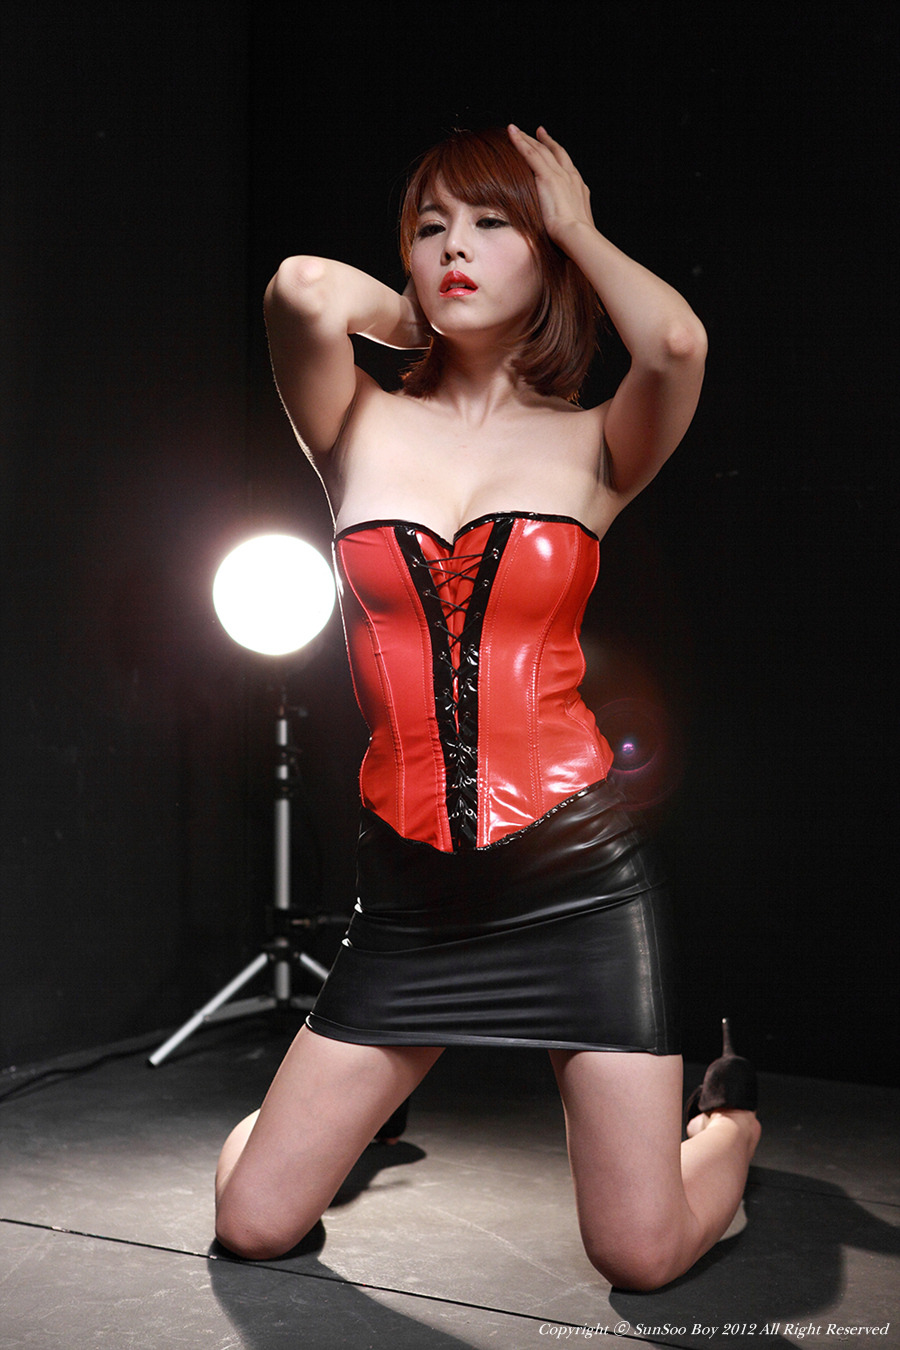 Sexy korean girls october, naught pics of girls and men